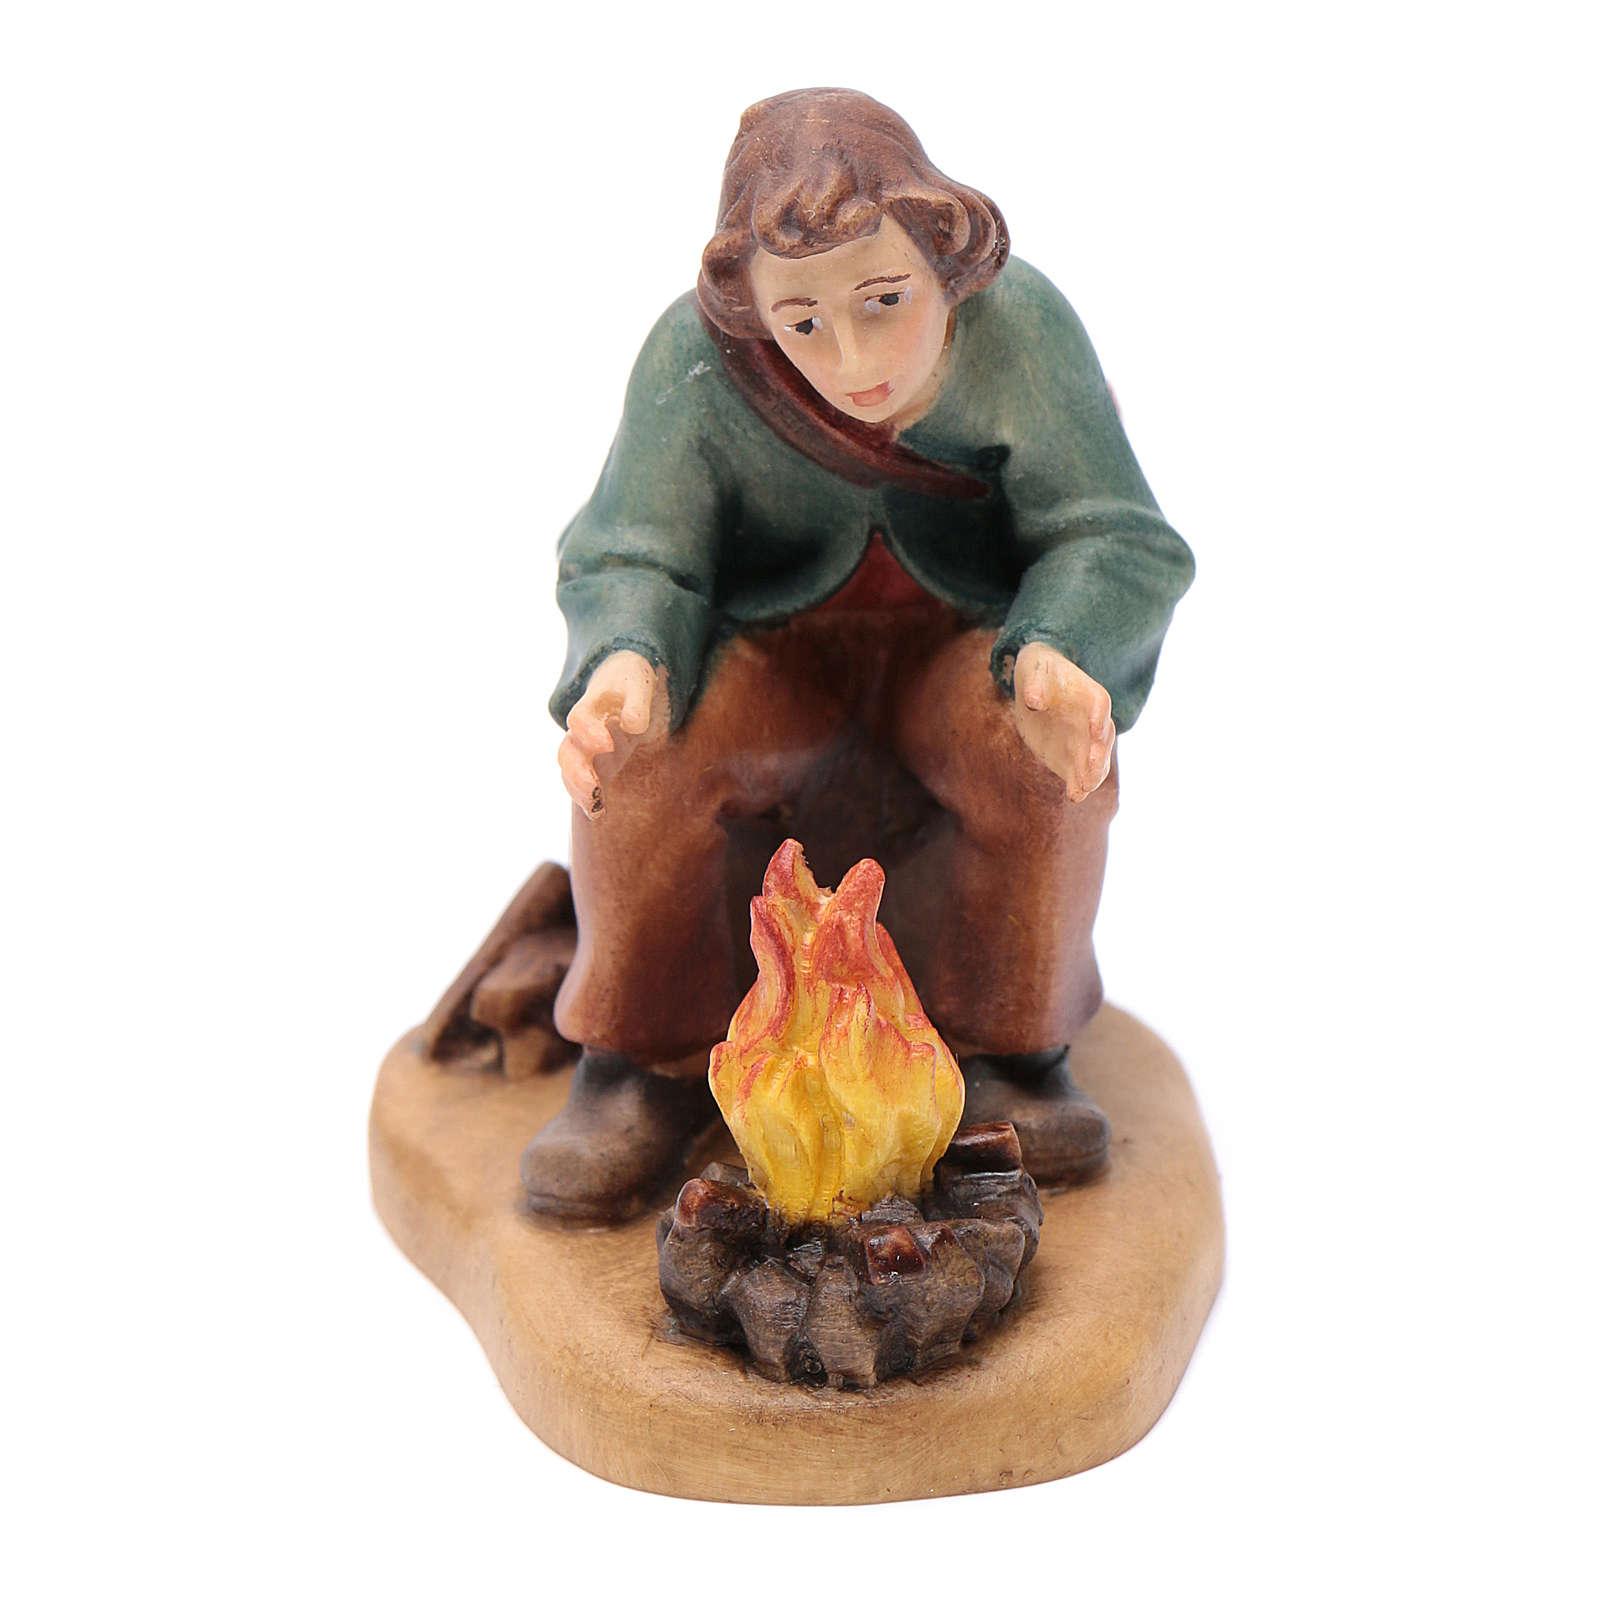 Pastore con fuoco 12 cm legno presepe mod. Valgardena 4